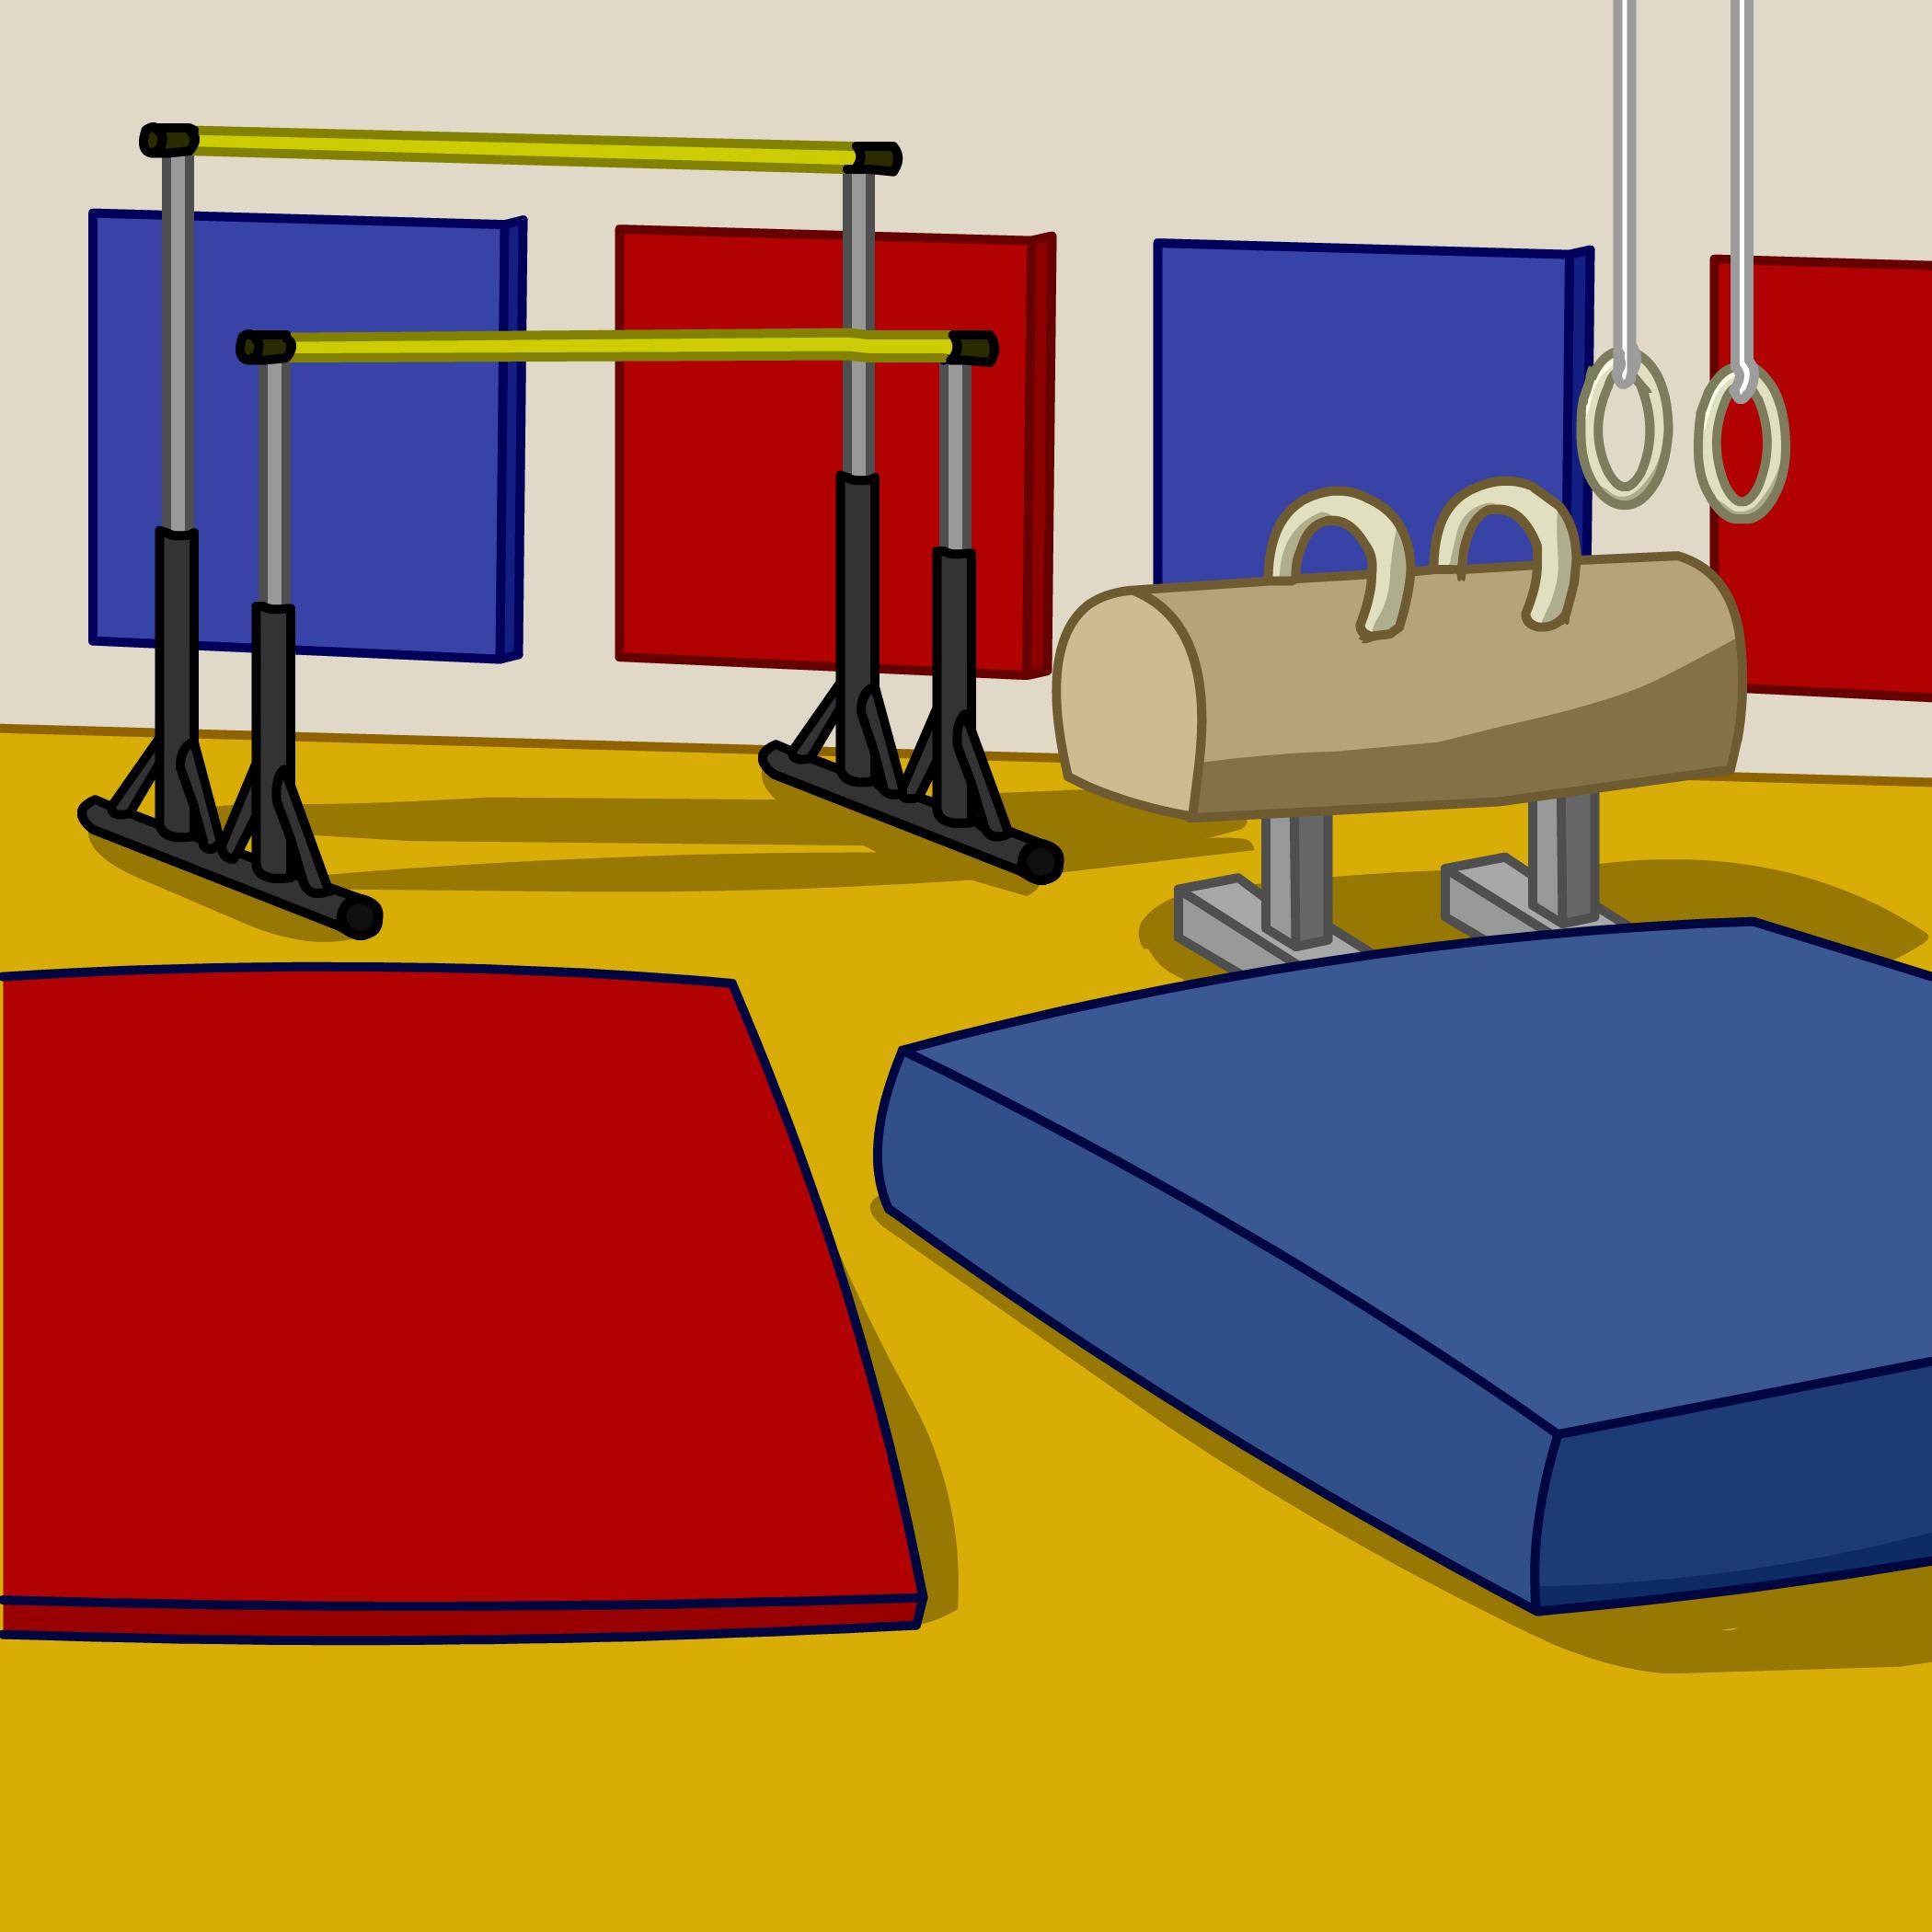 Cool Gymnastics Backgrounds Gymnastic background 2100x2100